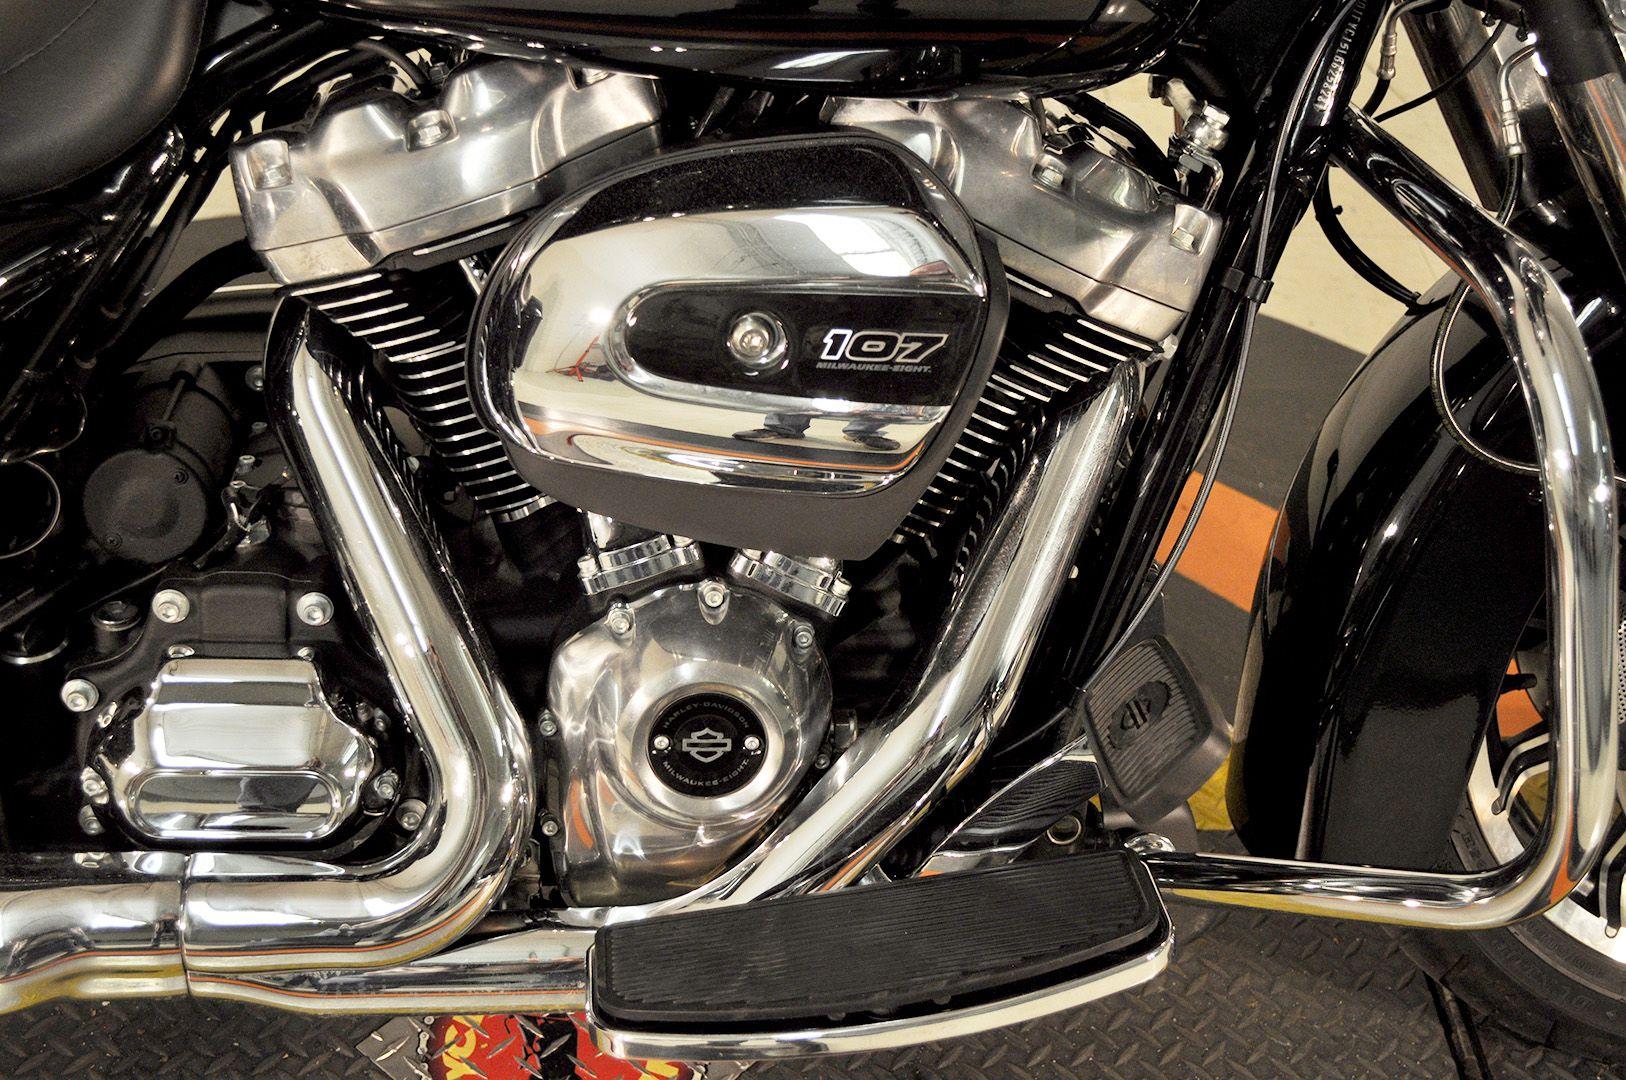 Certified Pre-Owned 2020 Harley-Davidson Electra Glide Standard